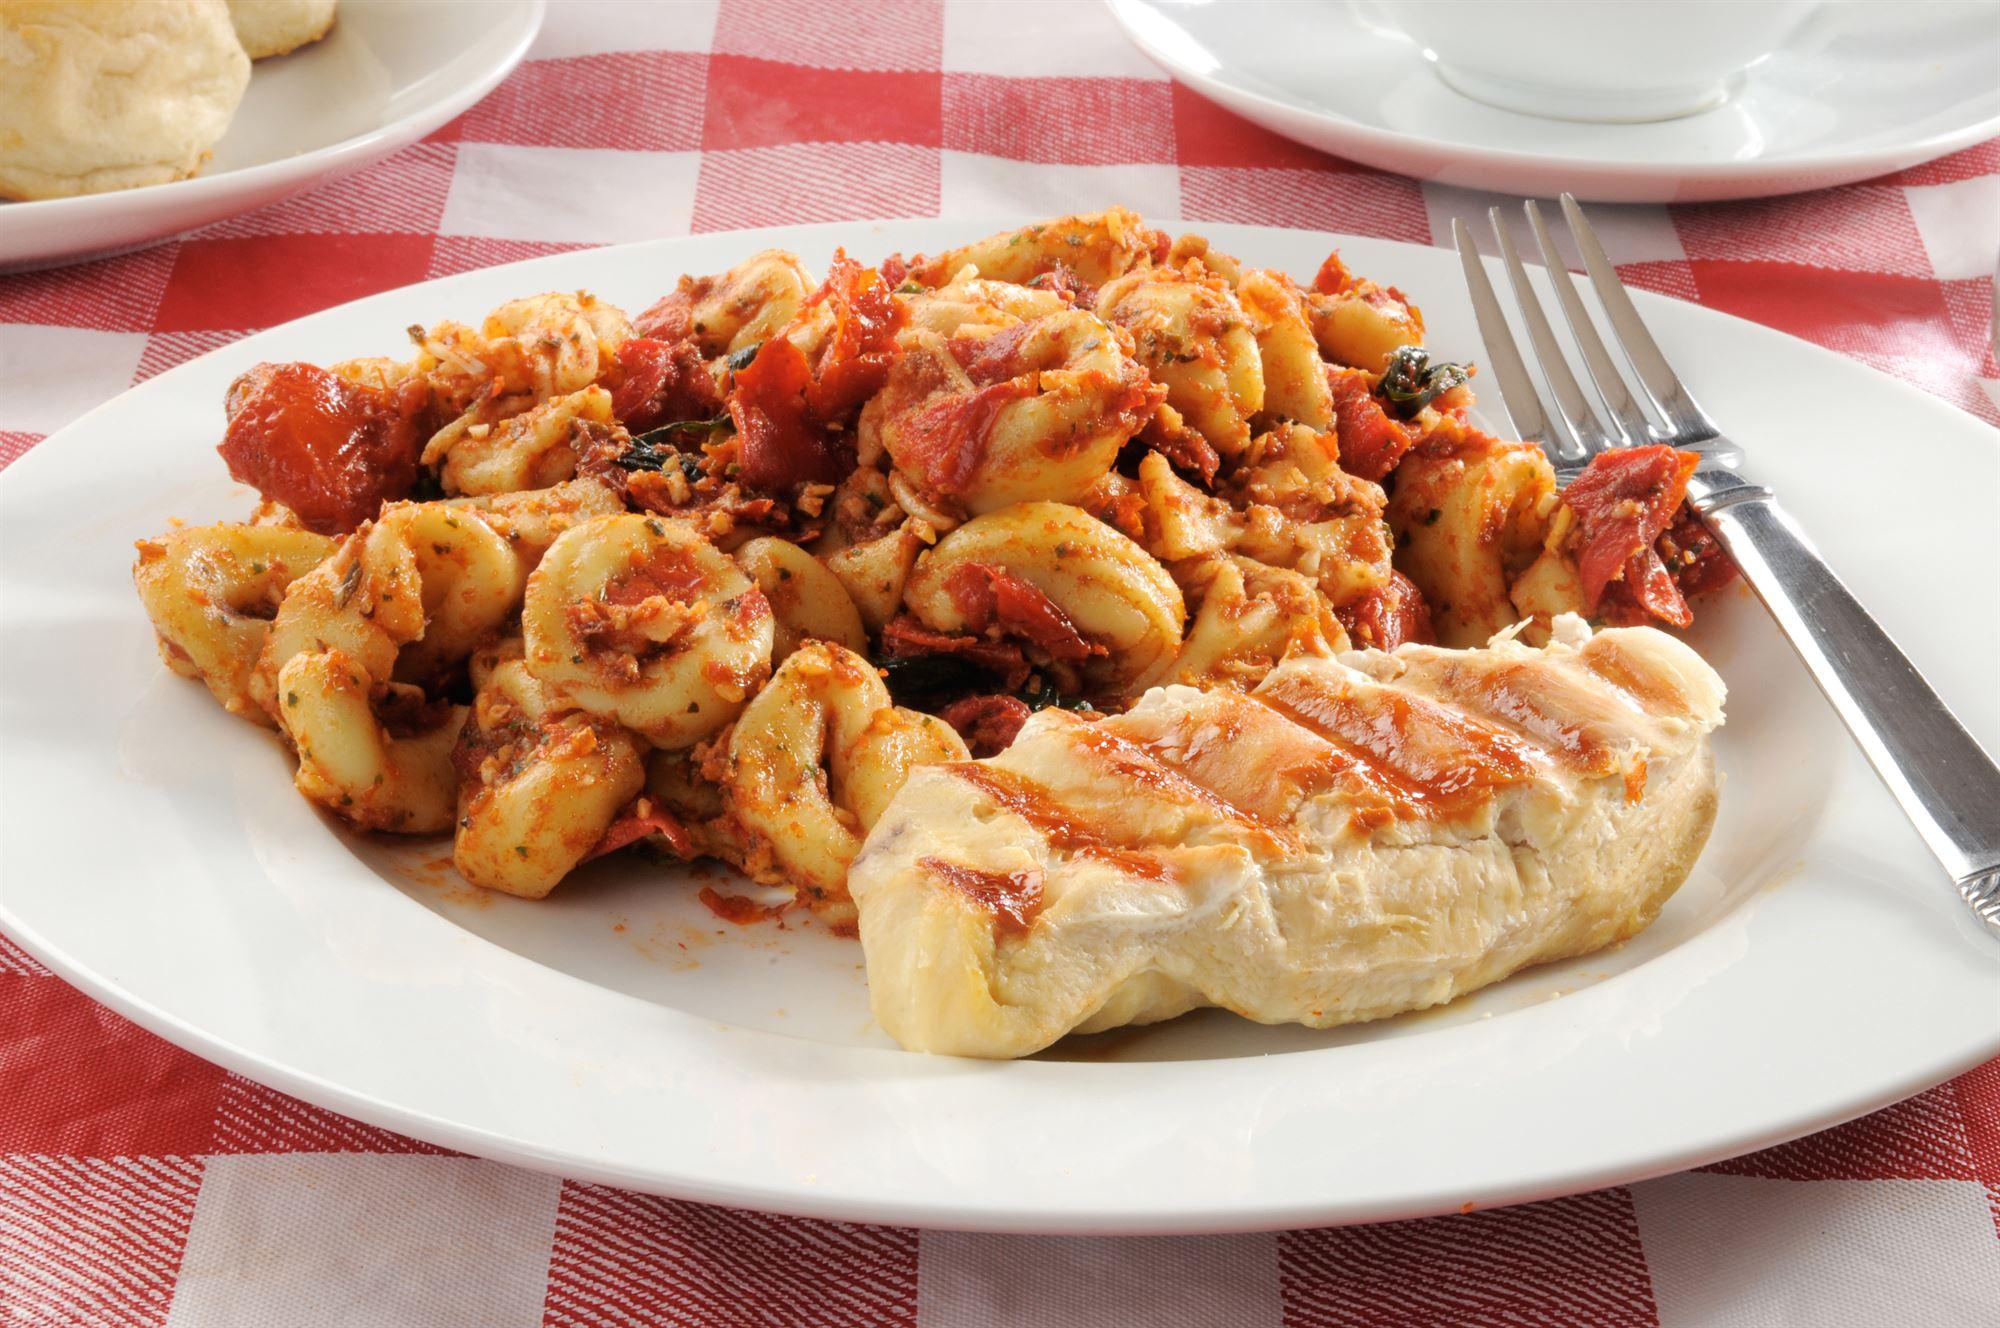 Pastasalat med tomatpesto og kyllingebryst